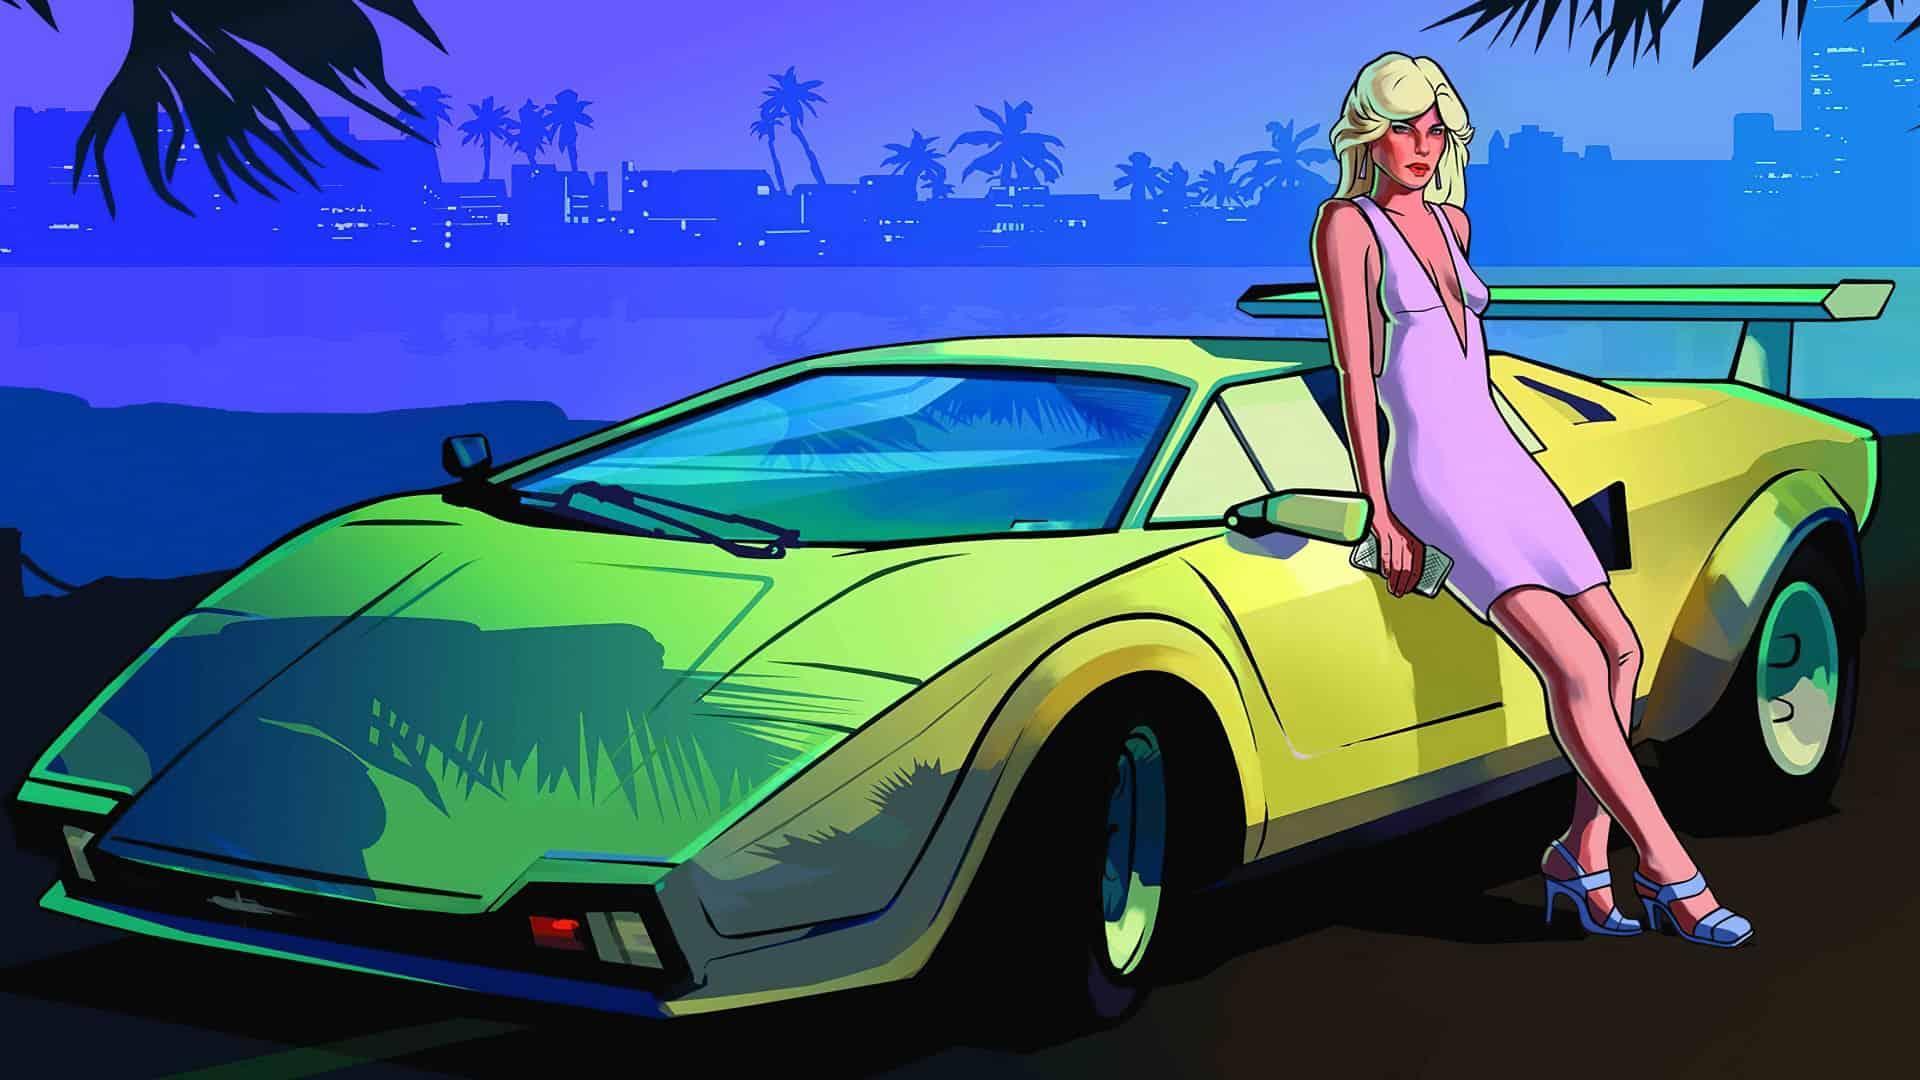 Best GTA Vice City Cheats - Vehicle Cheats